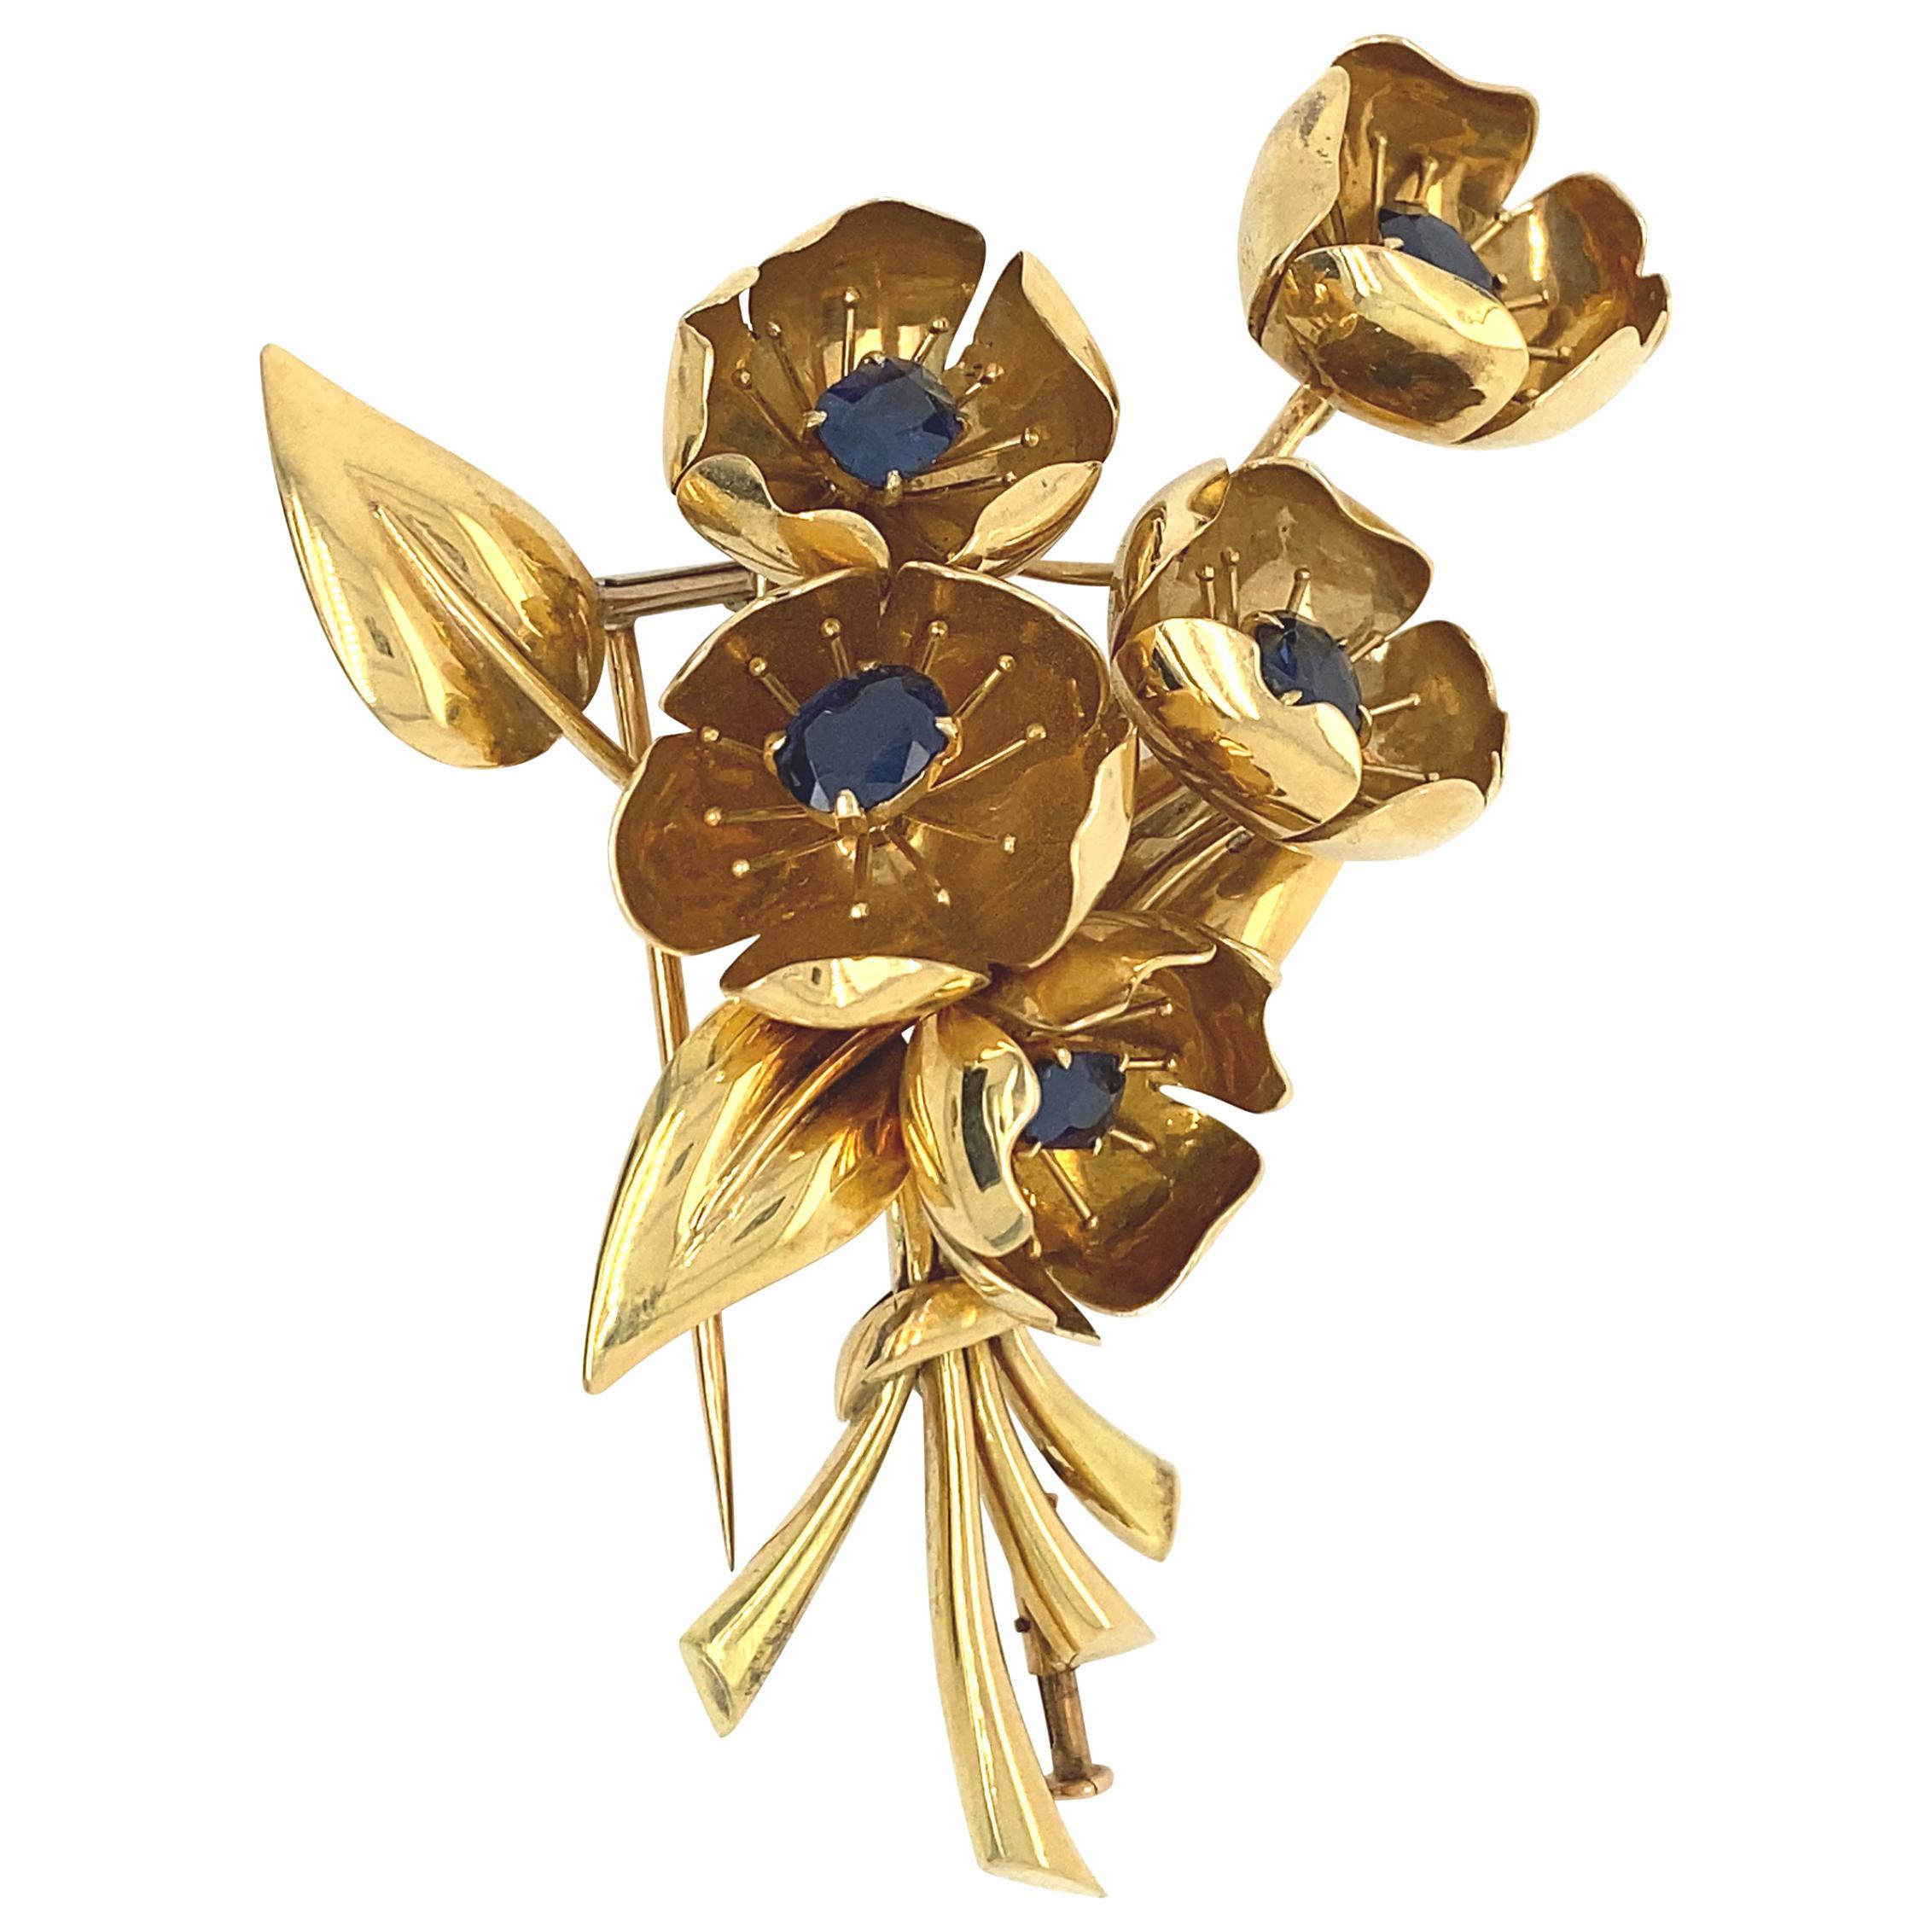 Van Cleef & Arpels Sapphire and 18k Gold Brooch